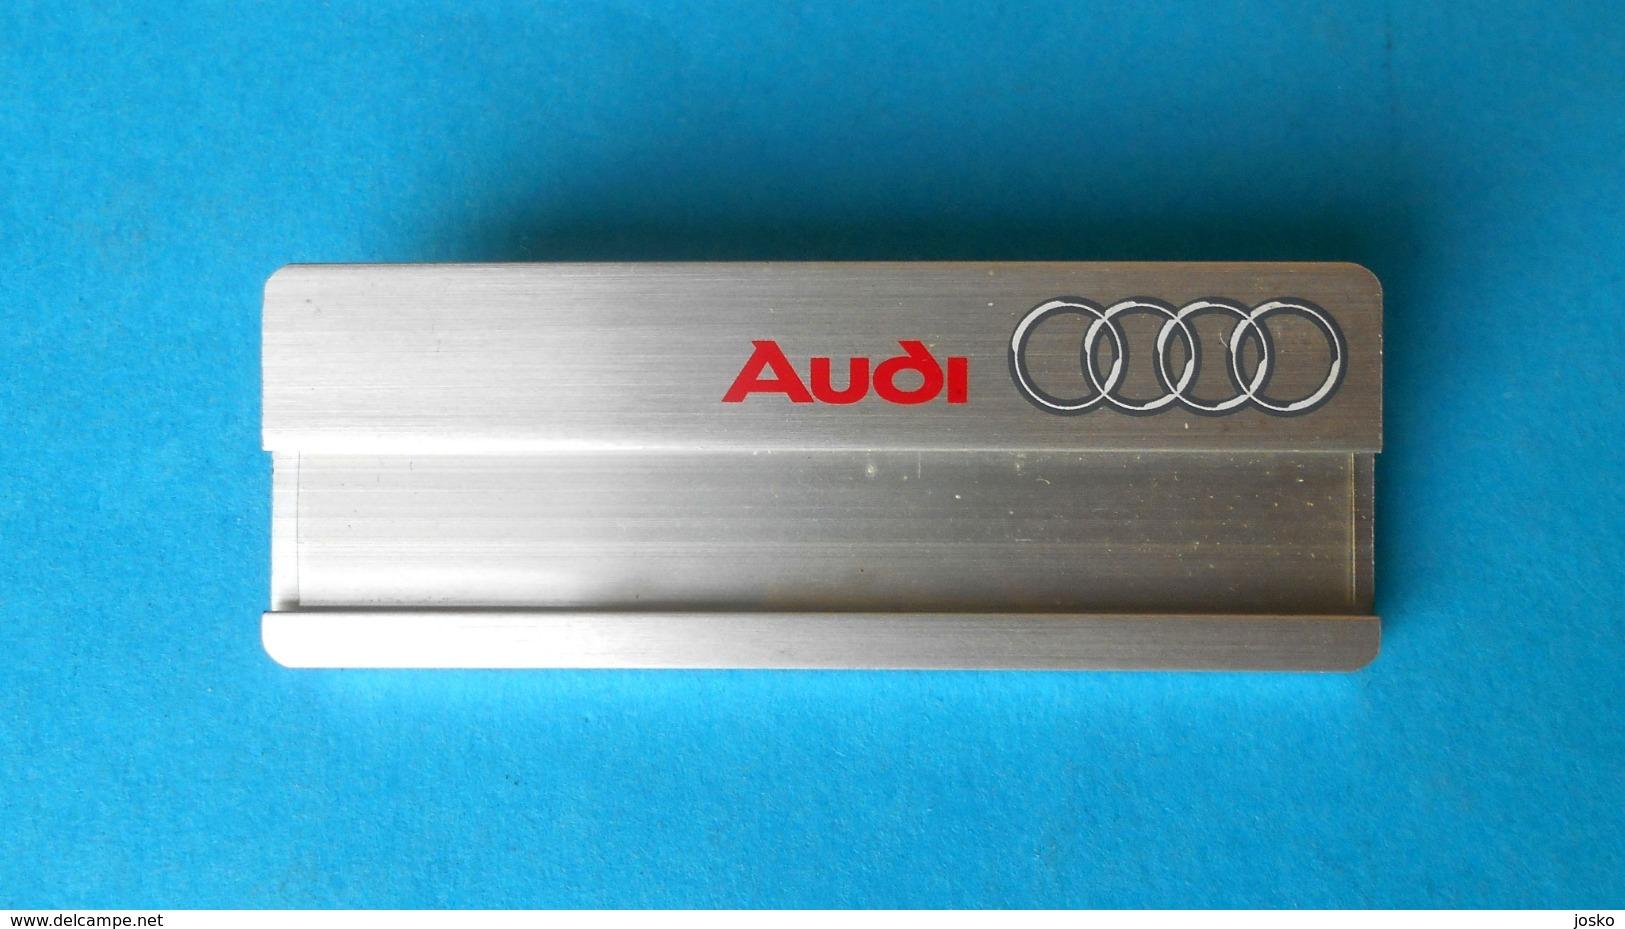 AUDI - Large Official Breast Badge * Germany Car Automobile Auto Automobil Anstecknadel Abzeichen Deutschland Spilla - Badges